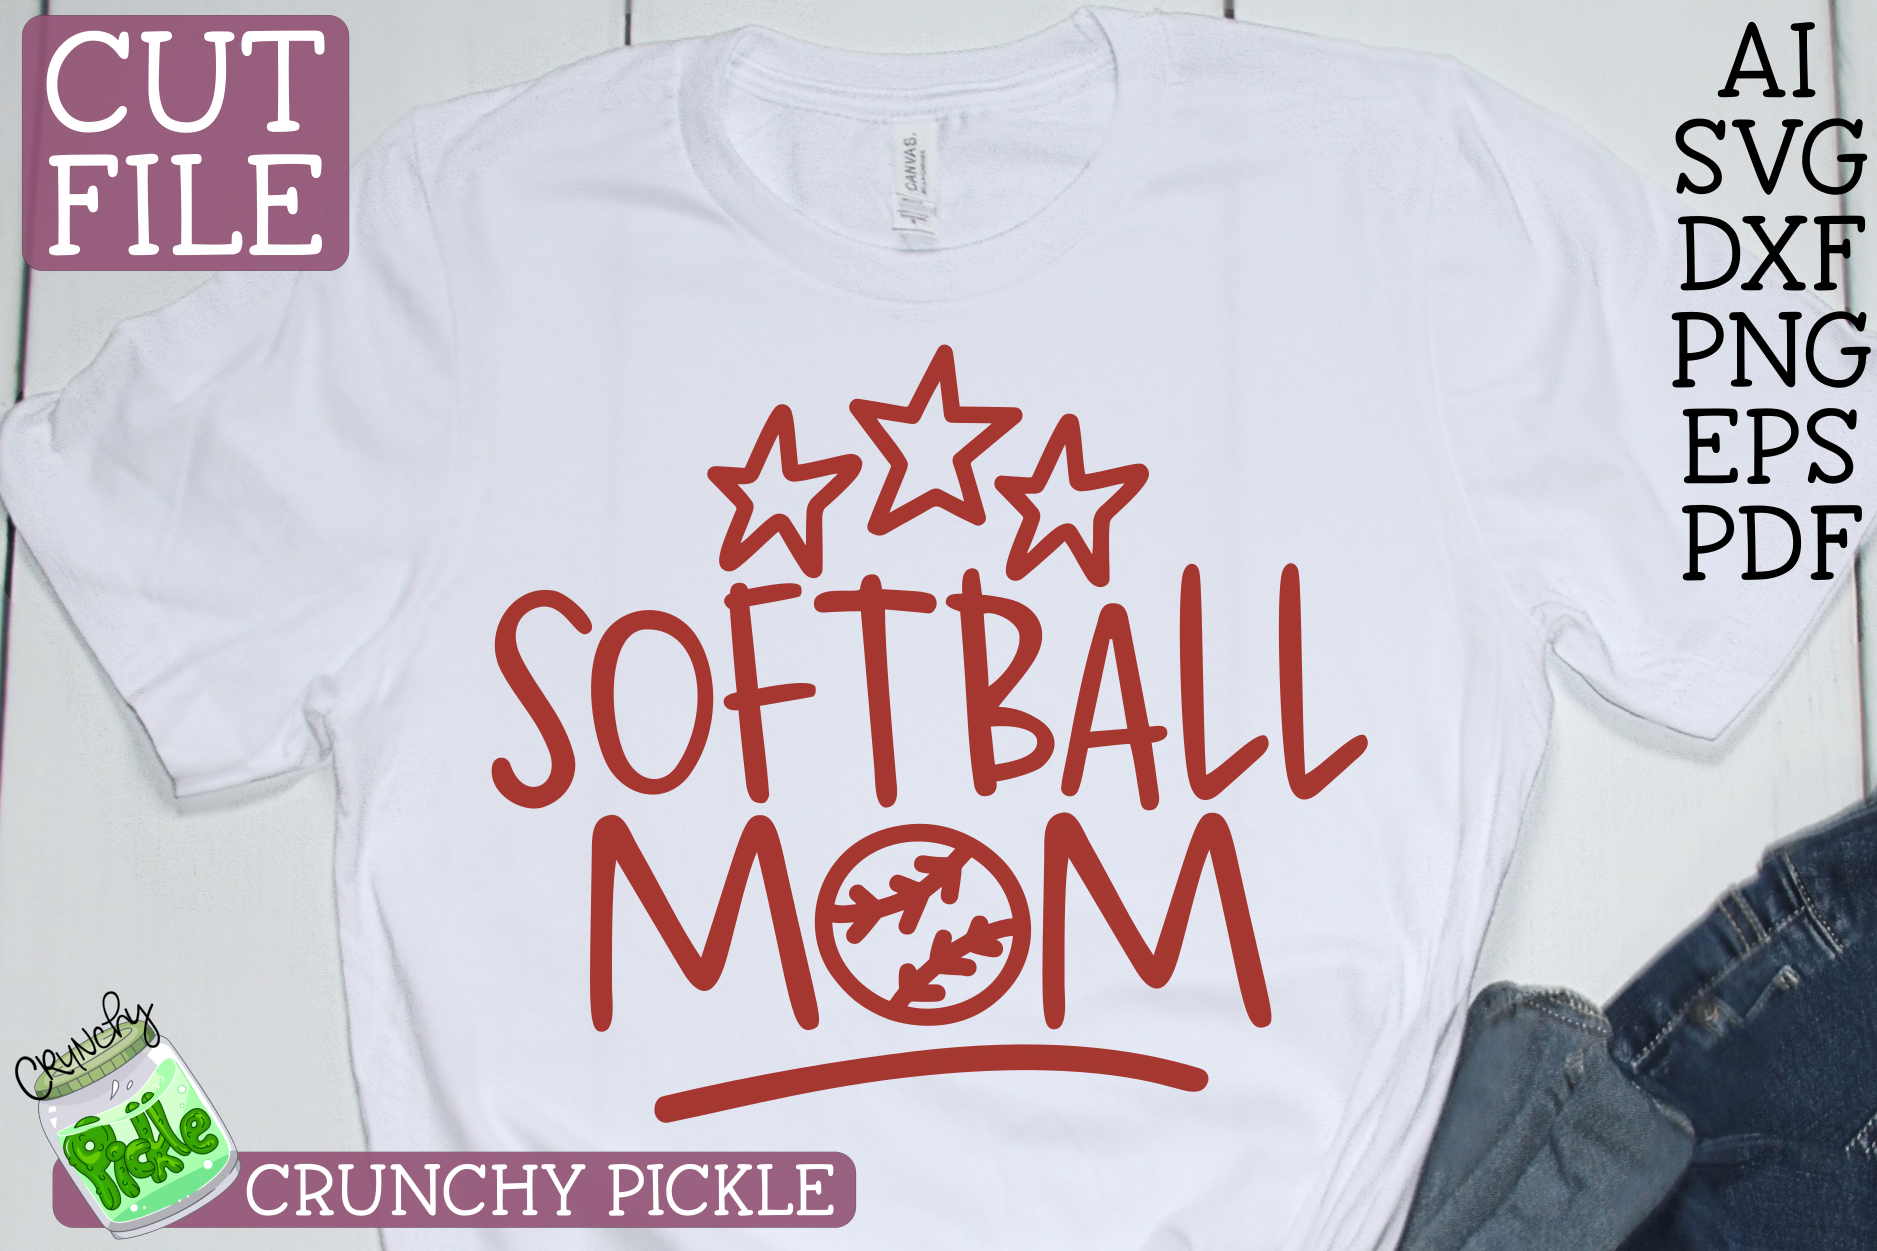 Softball Mom Sports SVG Cut File example image 1